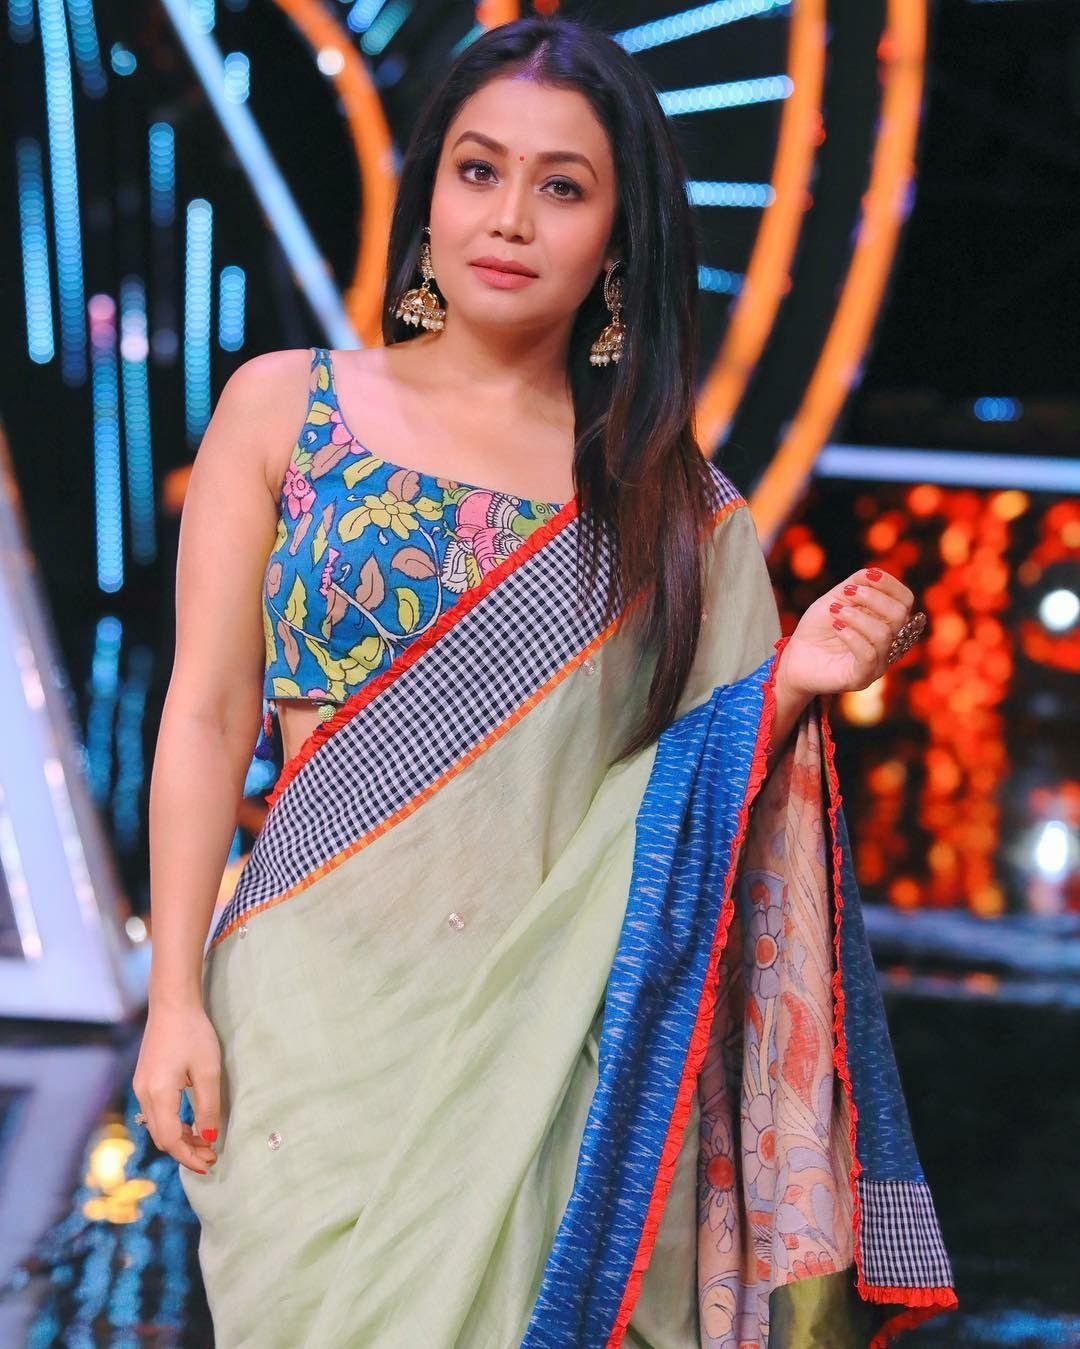 Neha Kakkar In Beautiful Saree Looks So Stunning Celebrity Outfits Neha Kakkar Indian Celebrities